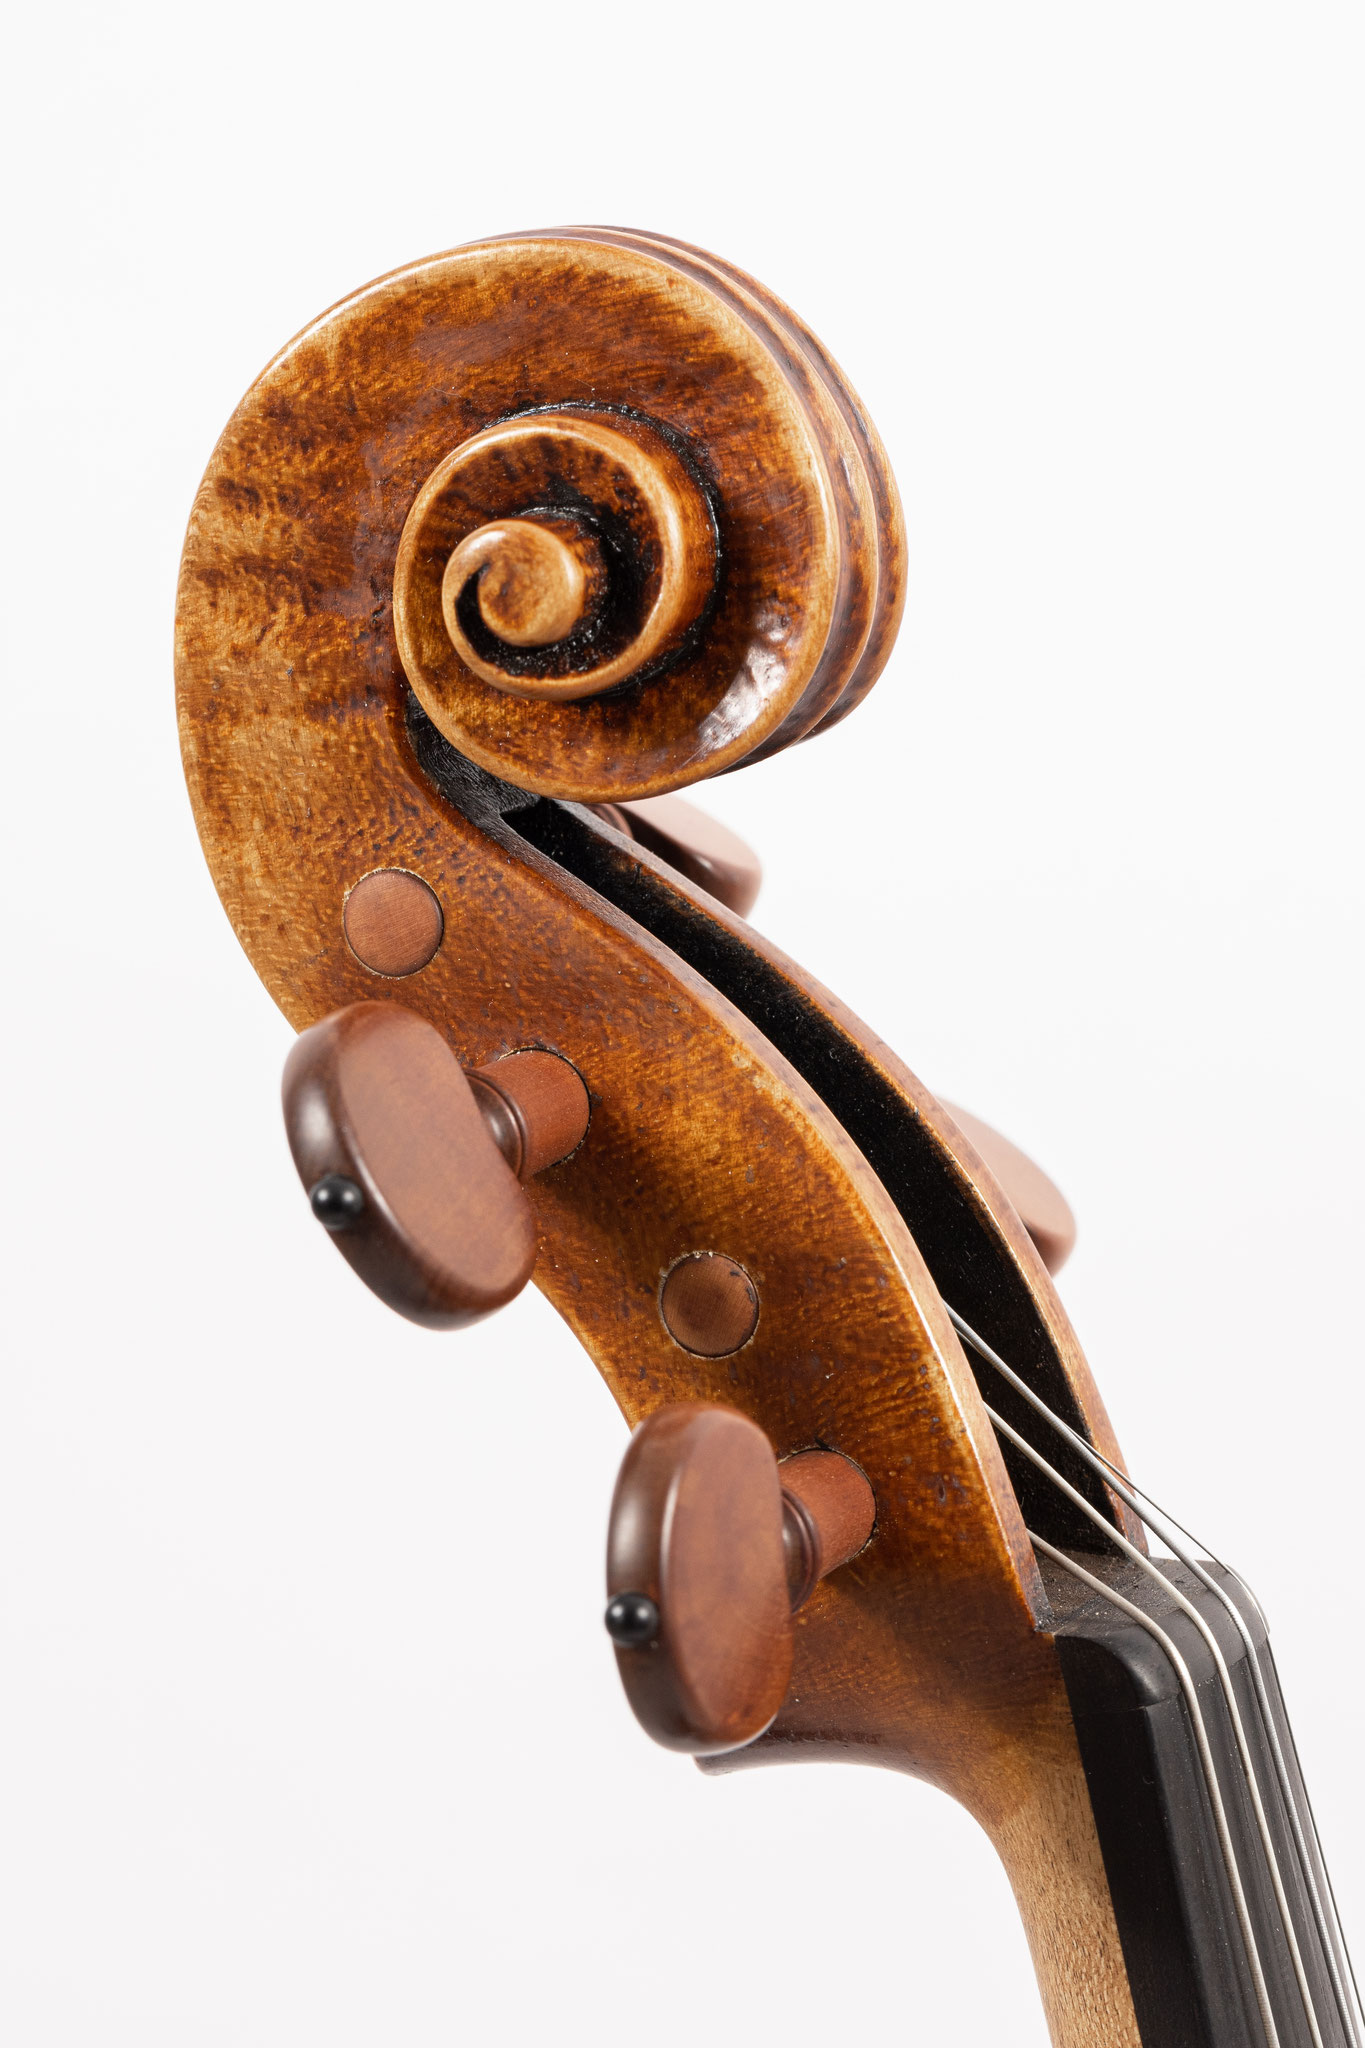 Violin after G. Guarneri del Gesù (2020/CH), Photo: VDB Photography